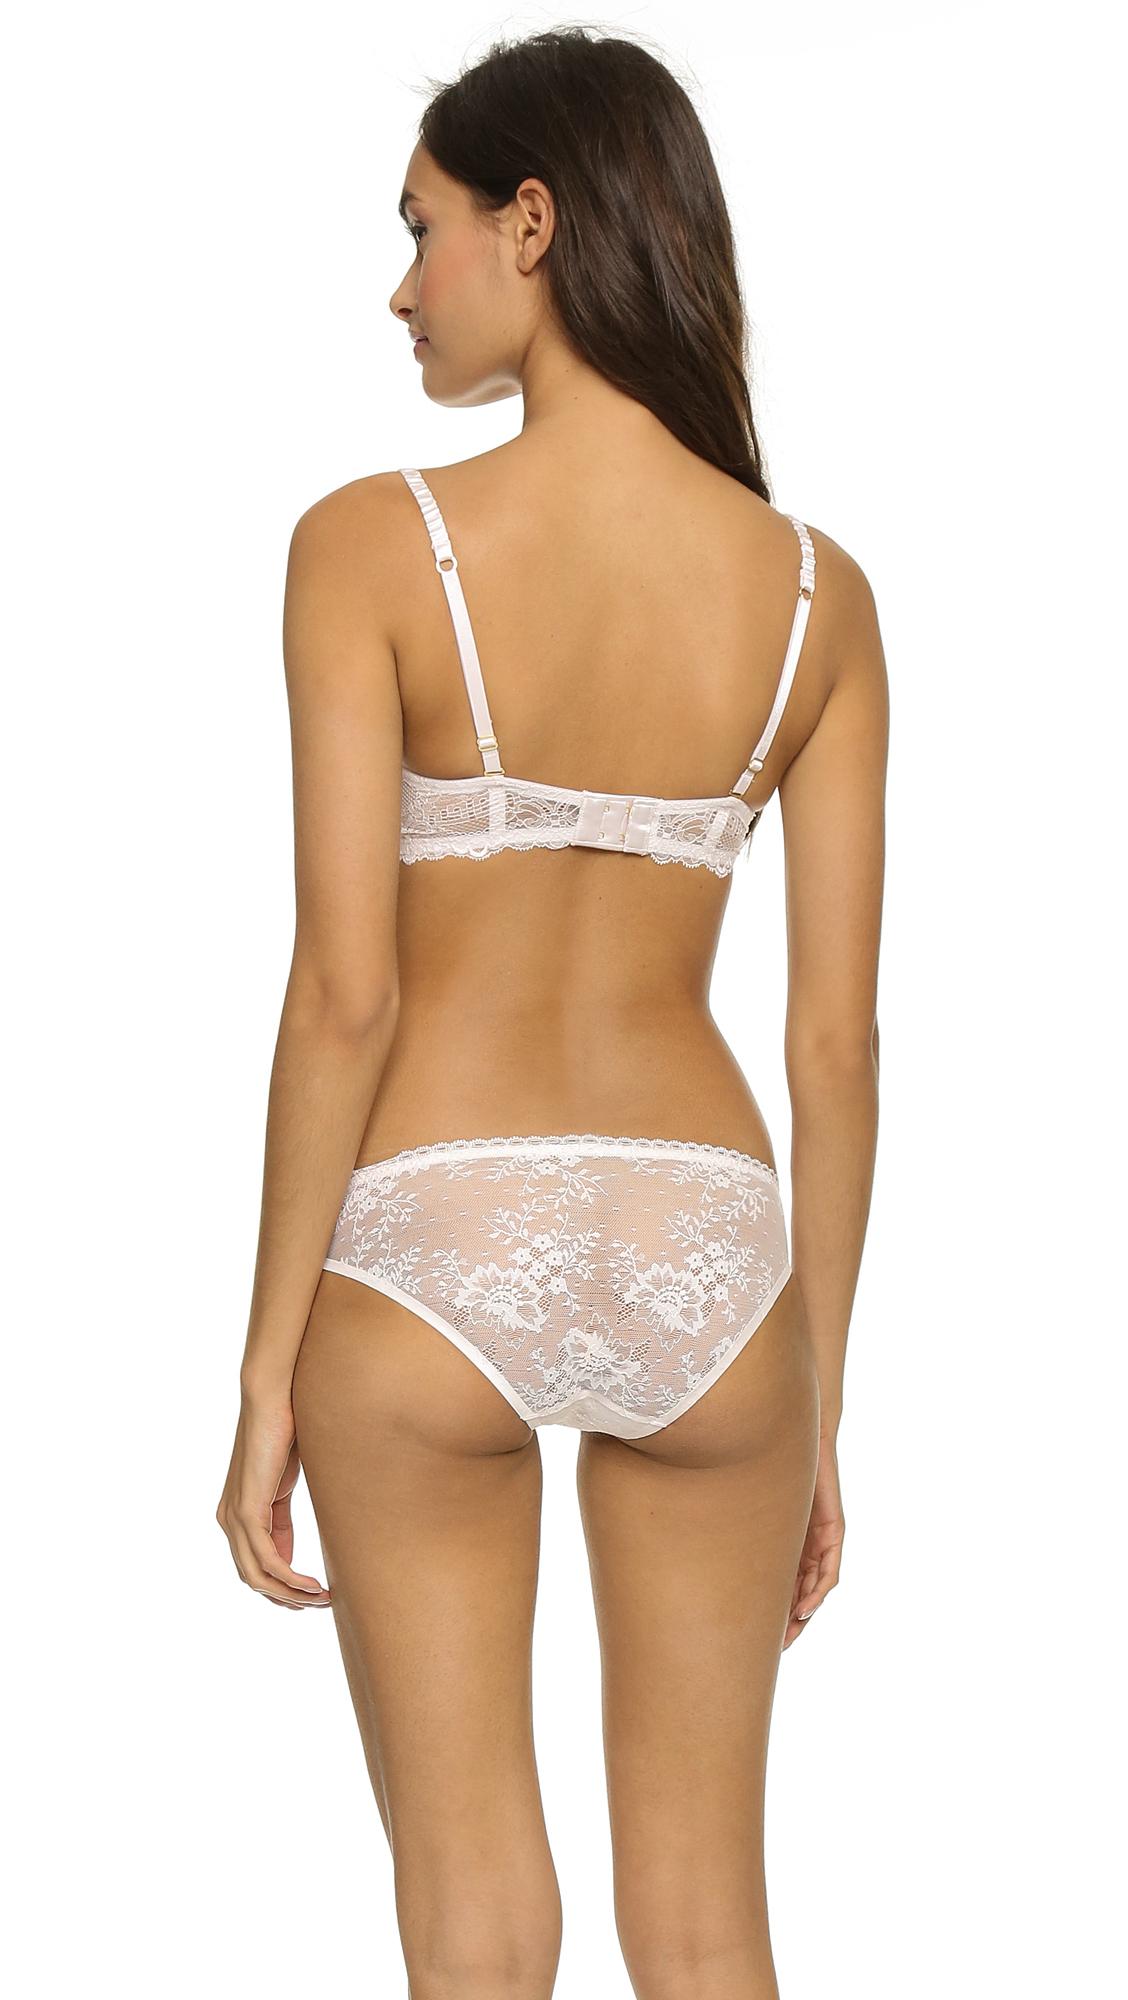 9266904681ff9 Lyst - Stella McCartney Mia Loving Strapless Bra - Floral White in White